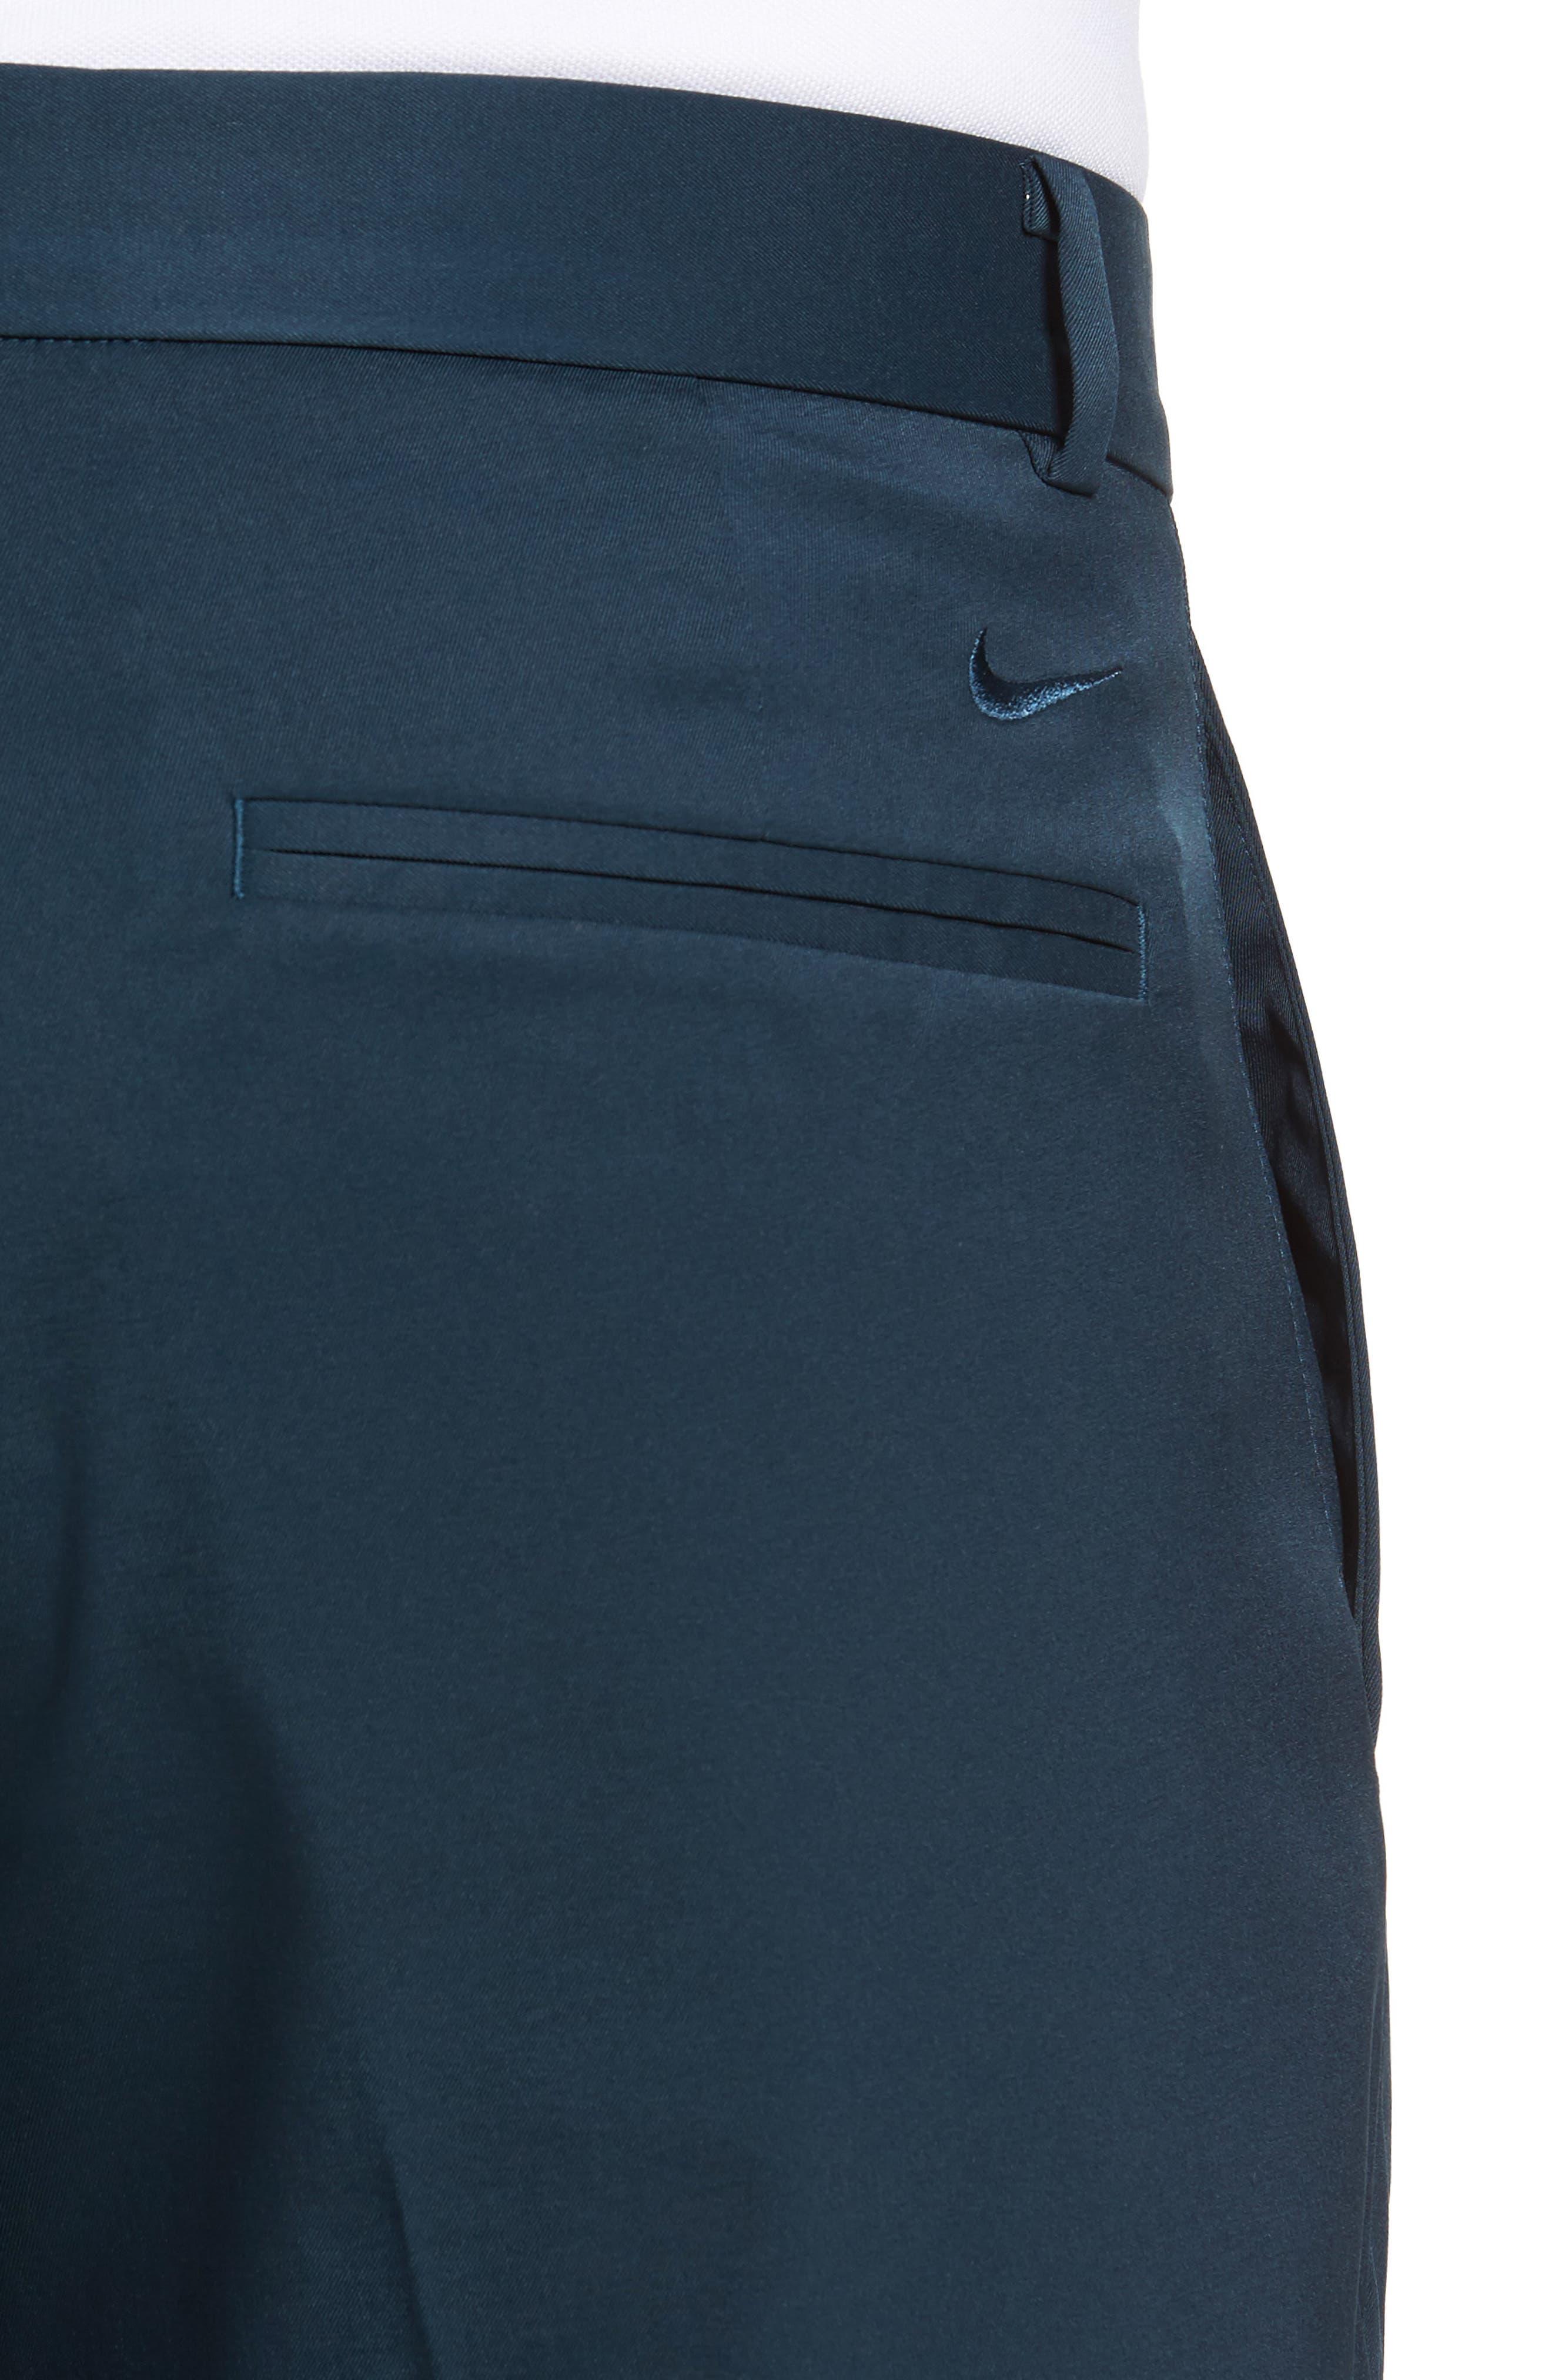 Flat Front Golf Shorts,                             Alternate thumbnail 35, color,